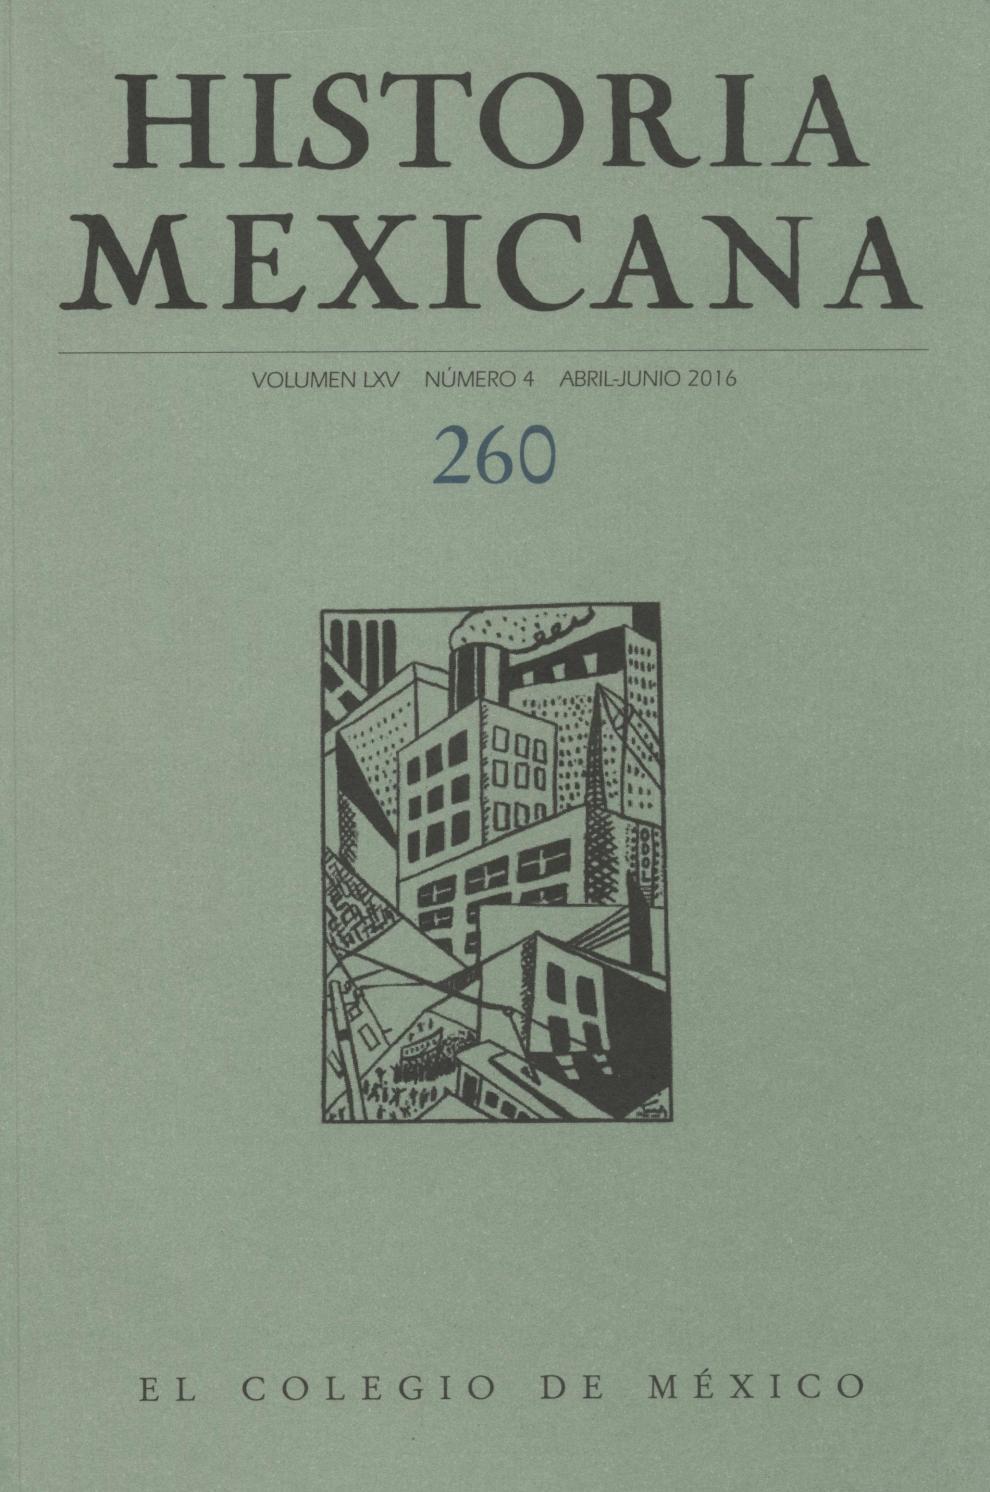 Historia mexicana 260 volumen 65 número 4 by Ce Ocelotl - issuu